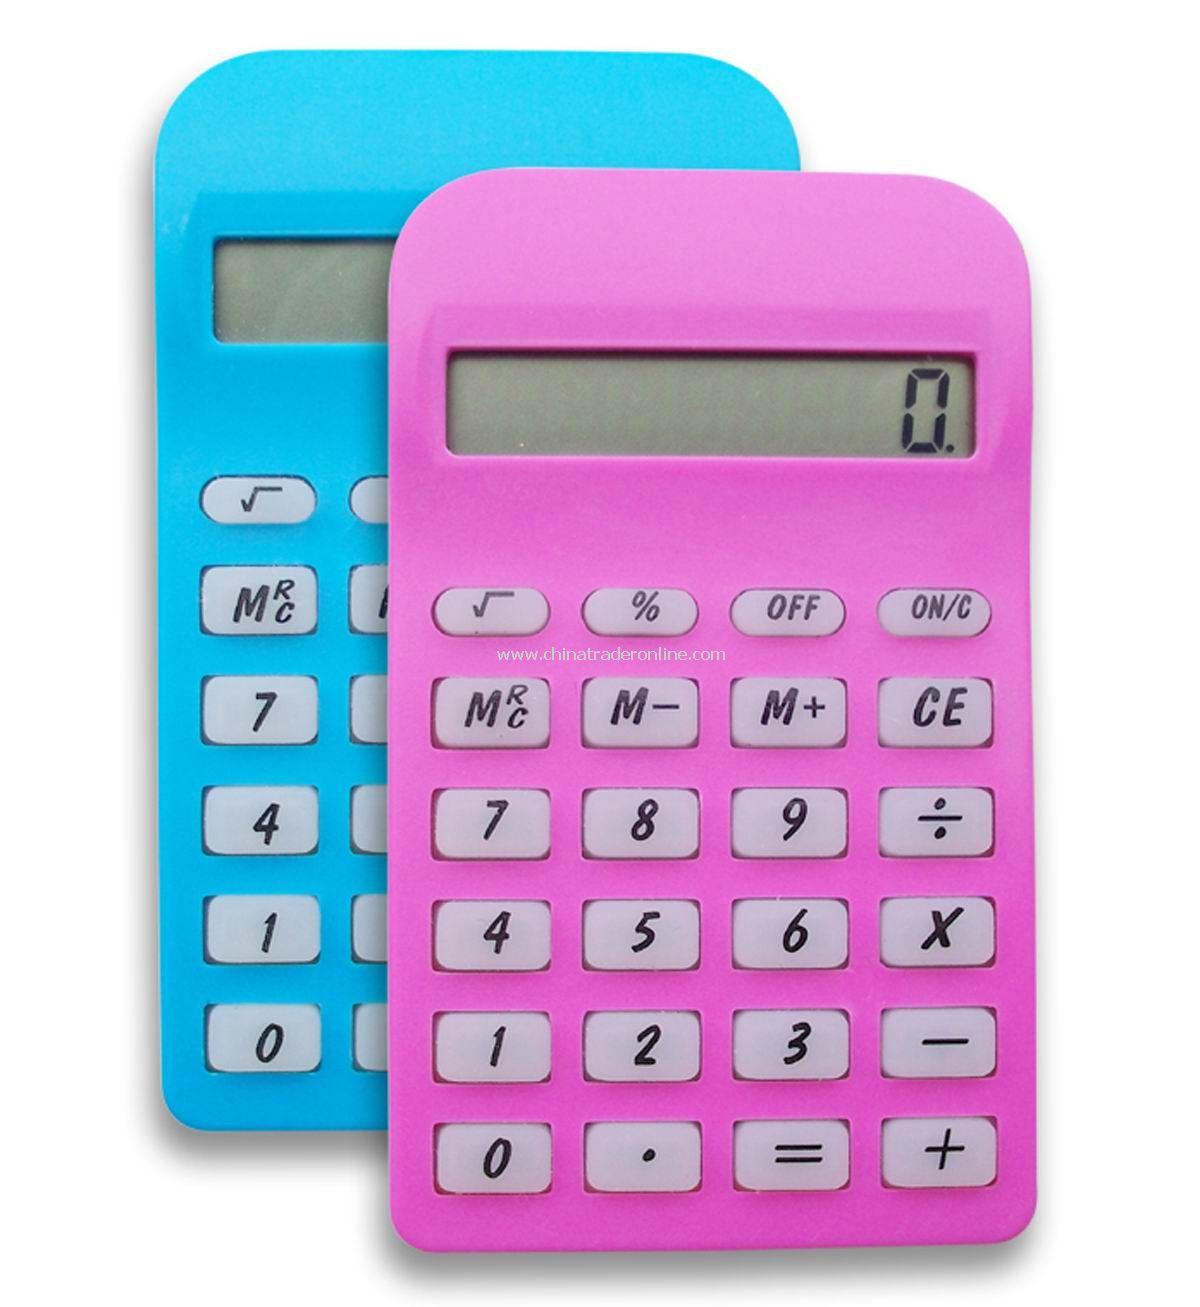 8 digits Handheld Calculator